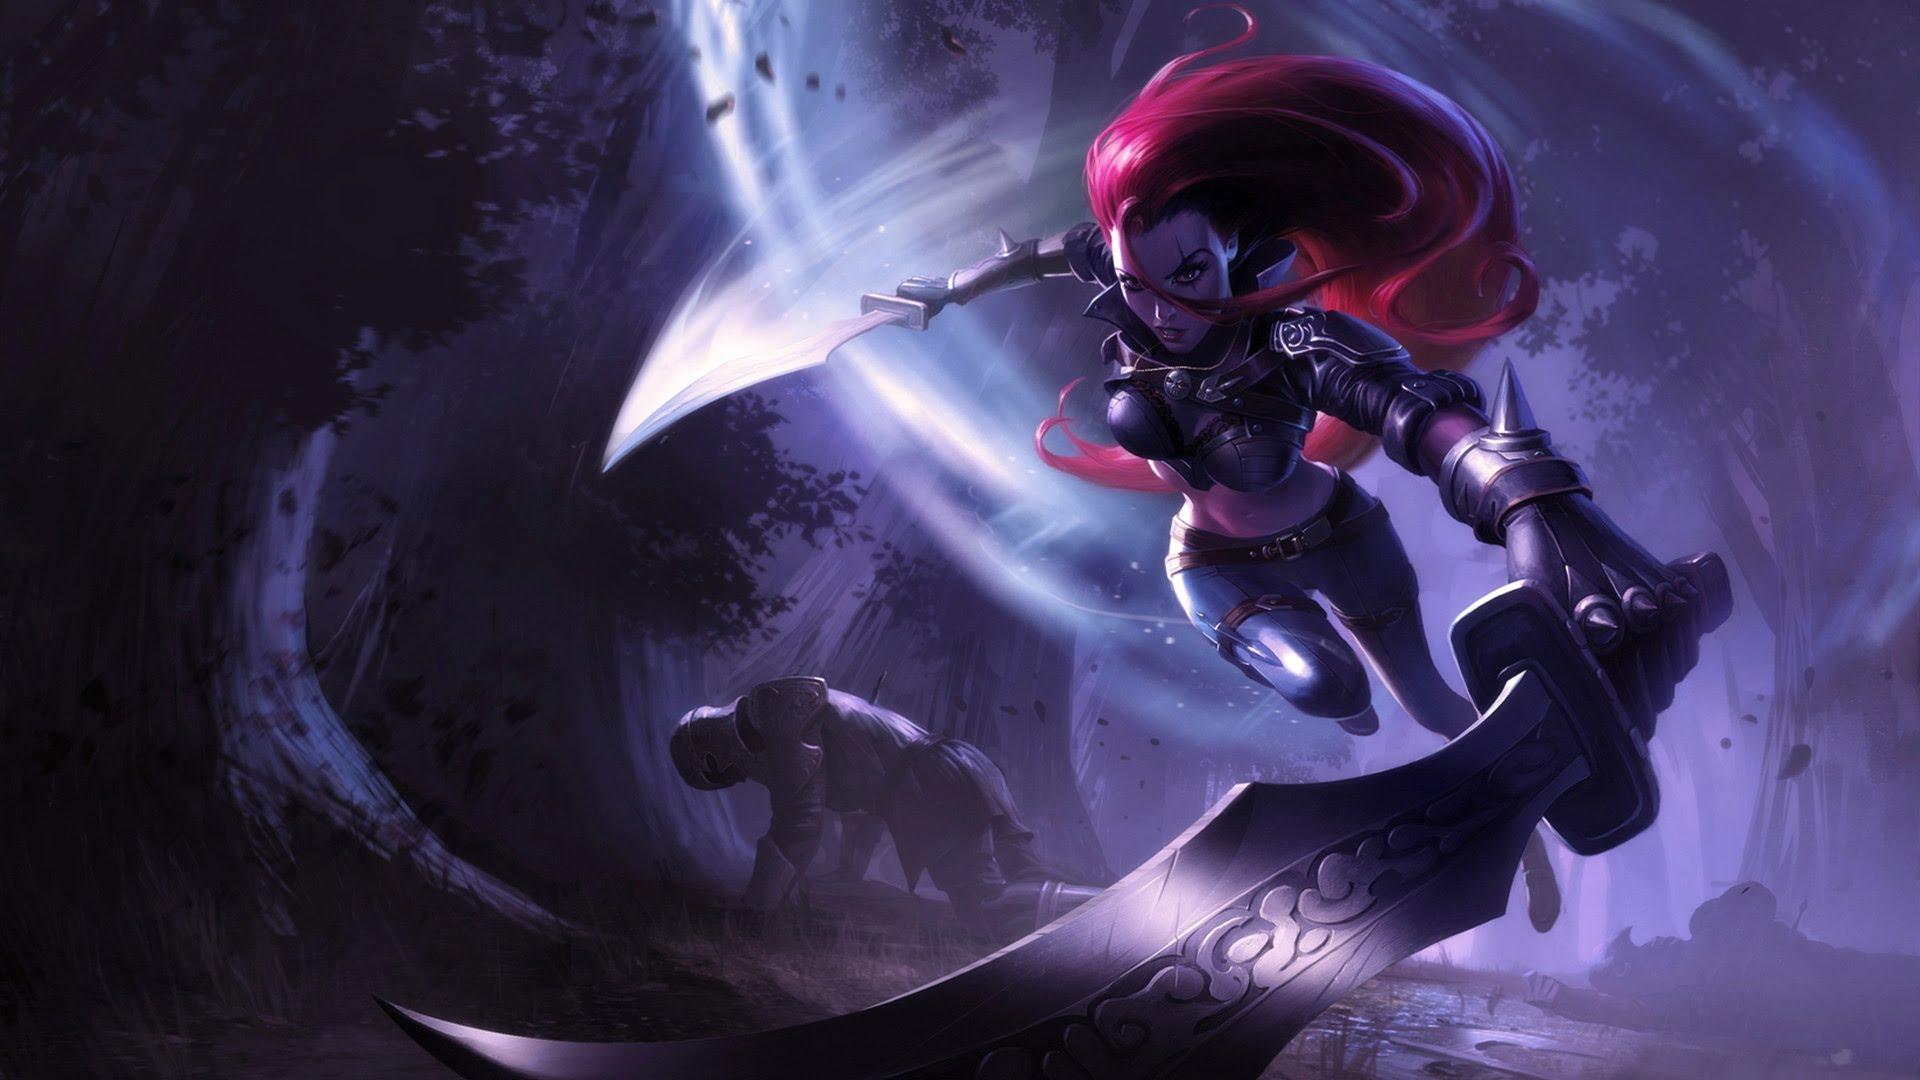 League of Legends Champion Katarina Fanart Wallpaper